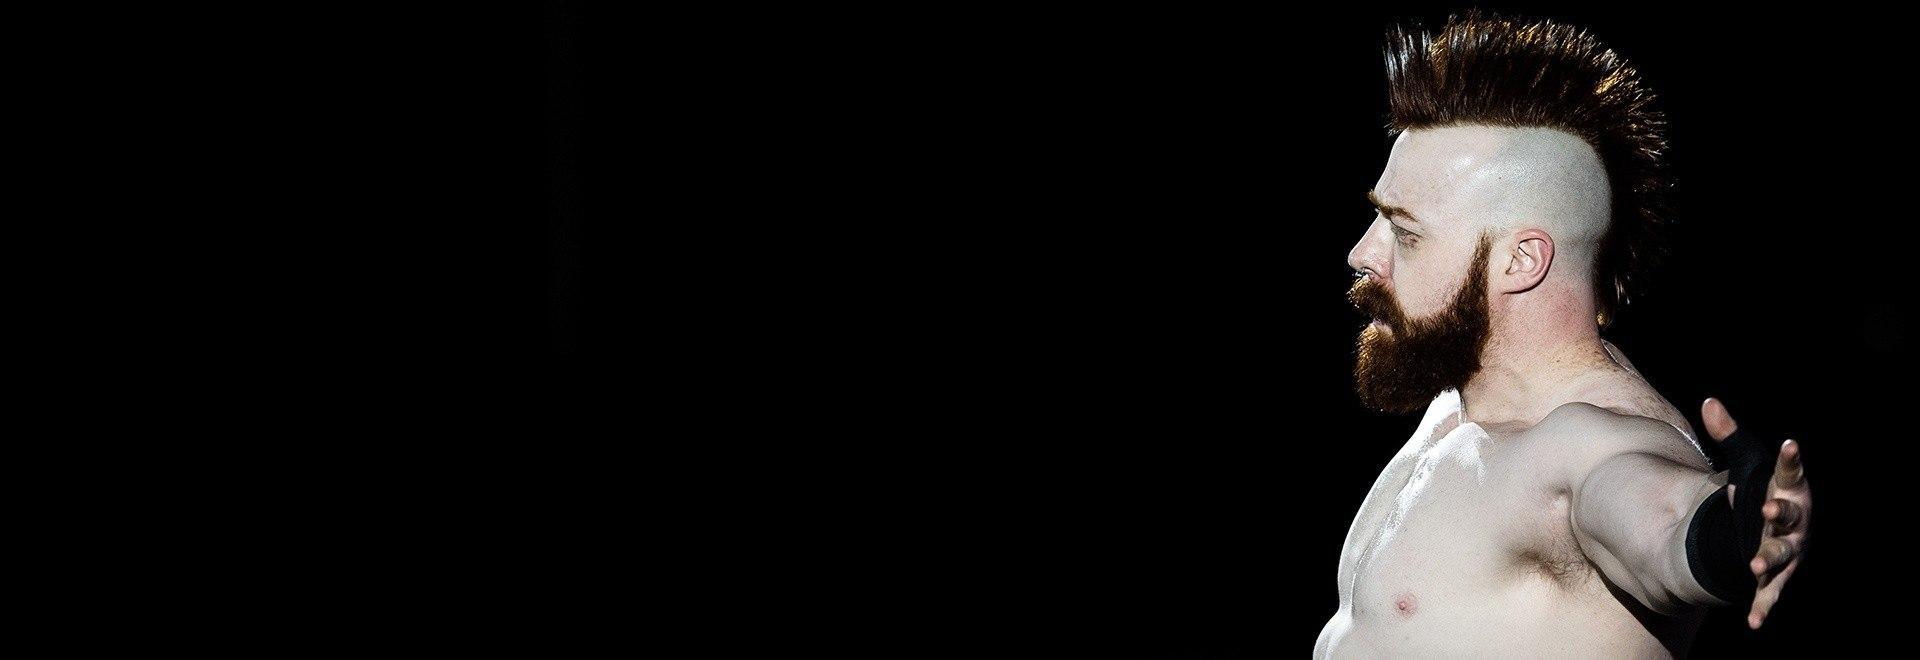 Ep. 249